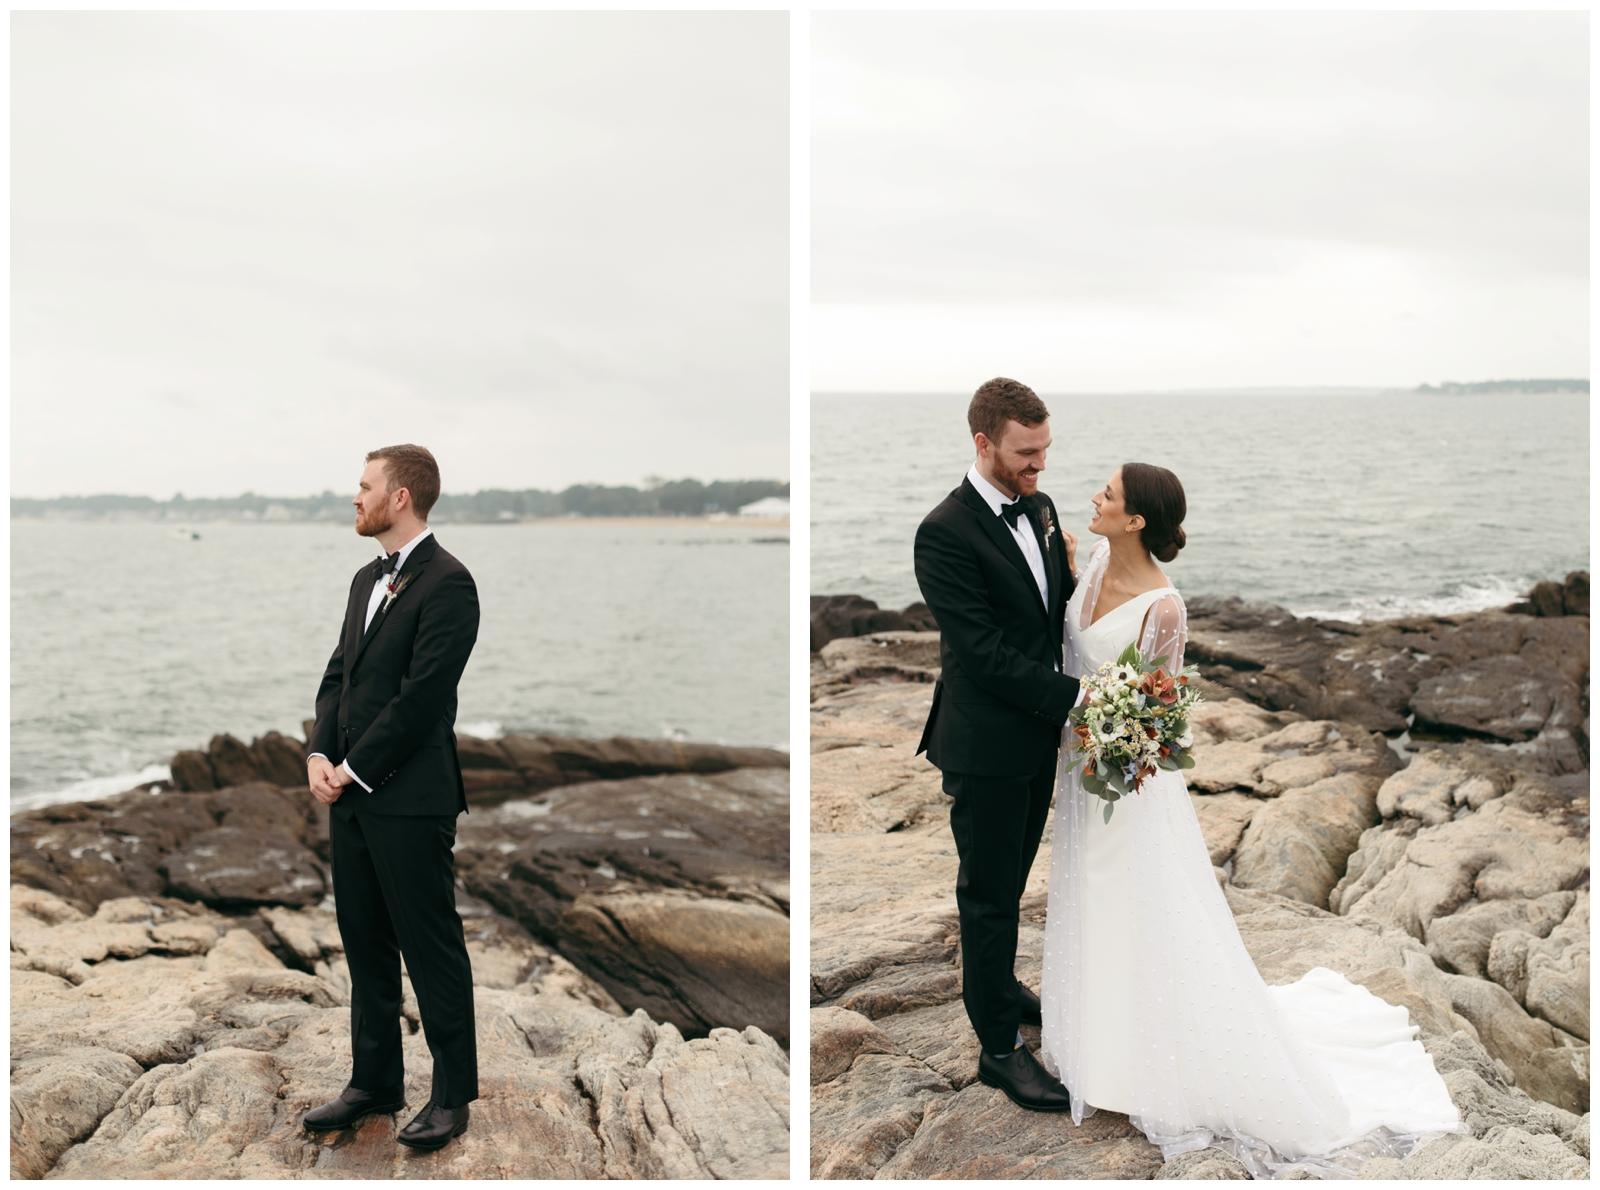 Madison-Beach-Hotel-Wedding-Bailey-Q-Photo-Boston-Wedding-Photographer-006.jpg